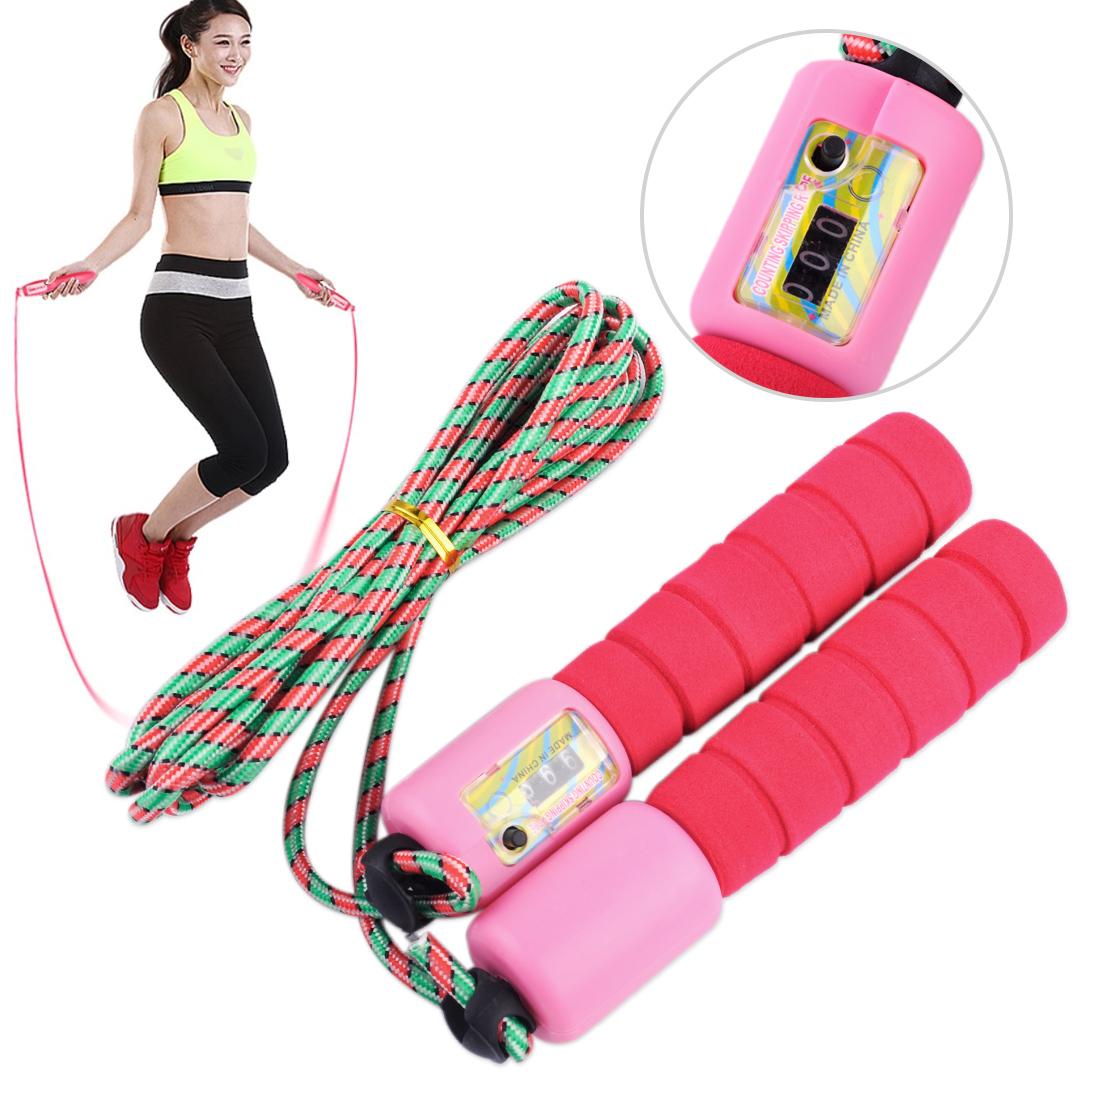 Corde à sauter avec compteur Speed Jump Rope sprungseil Corde Fitness Traning Sport